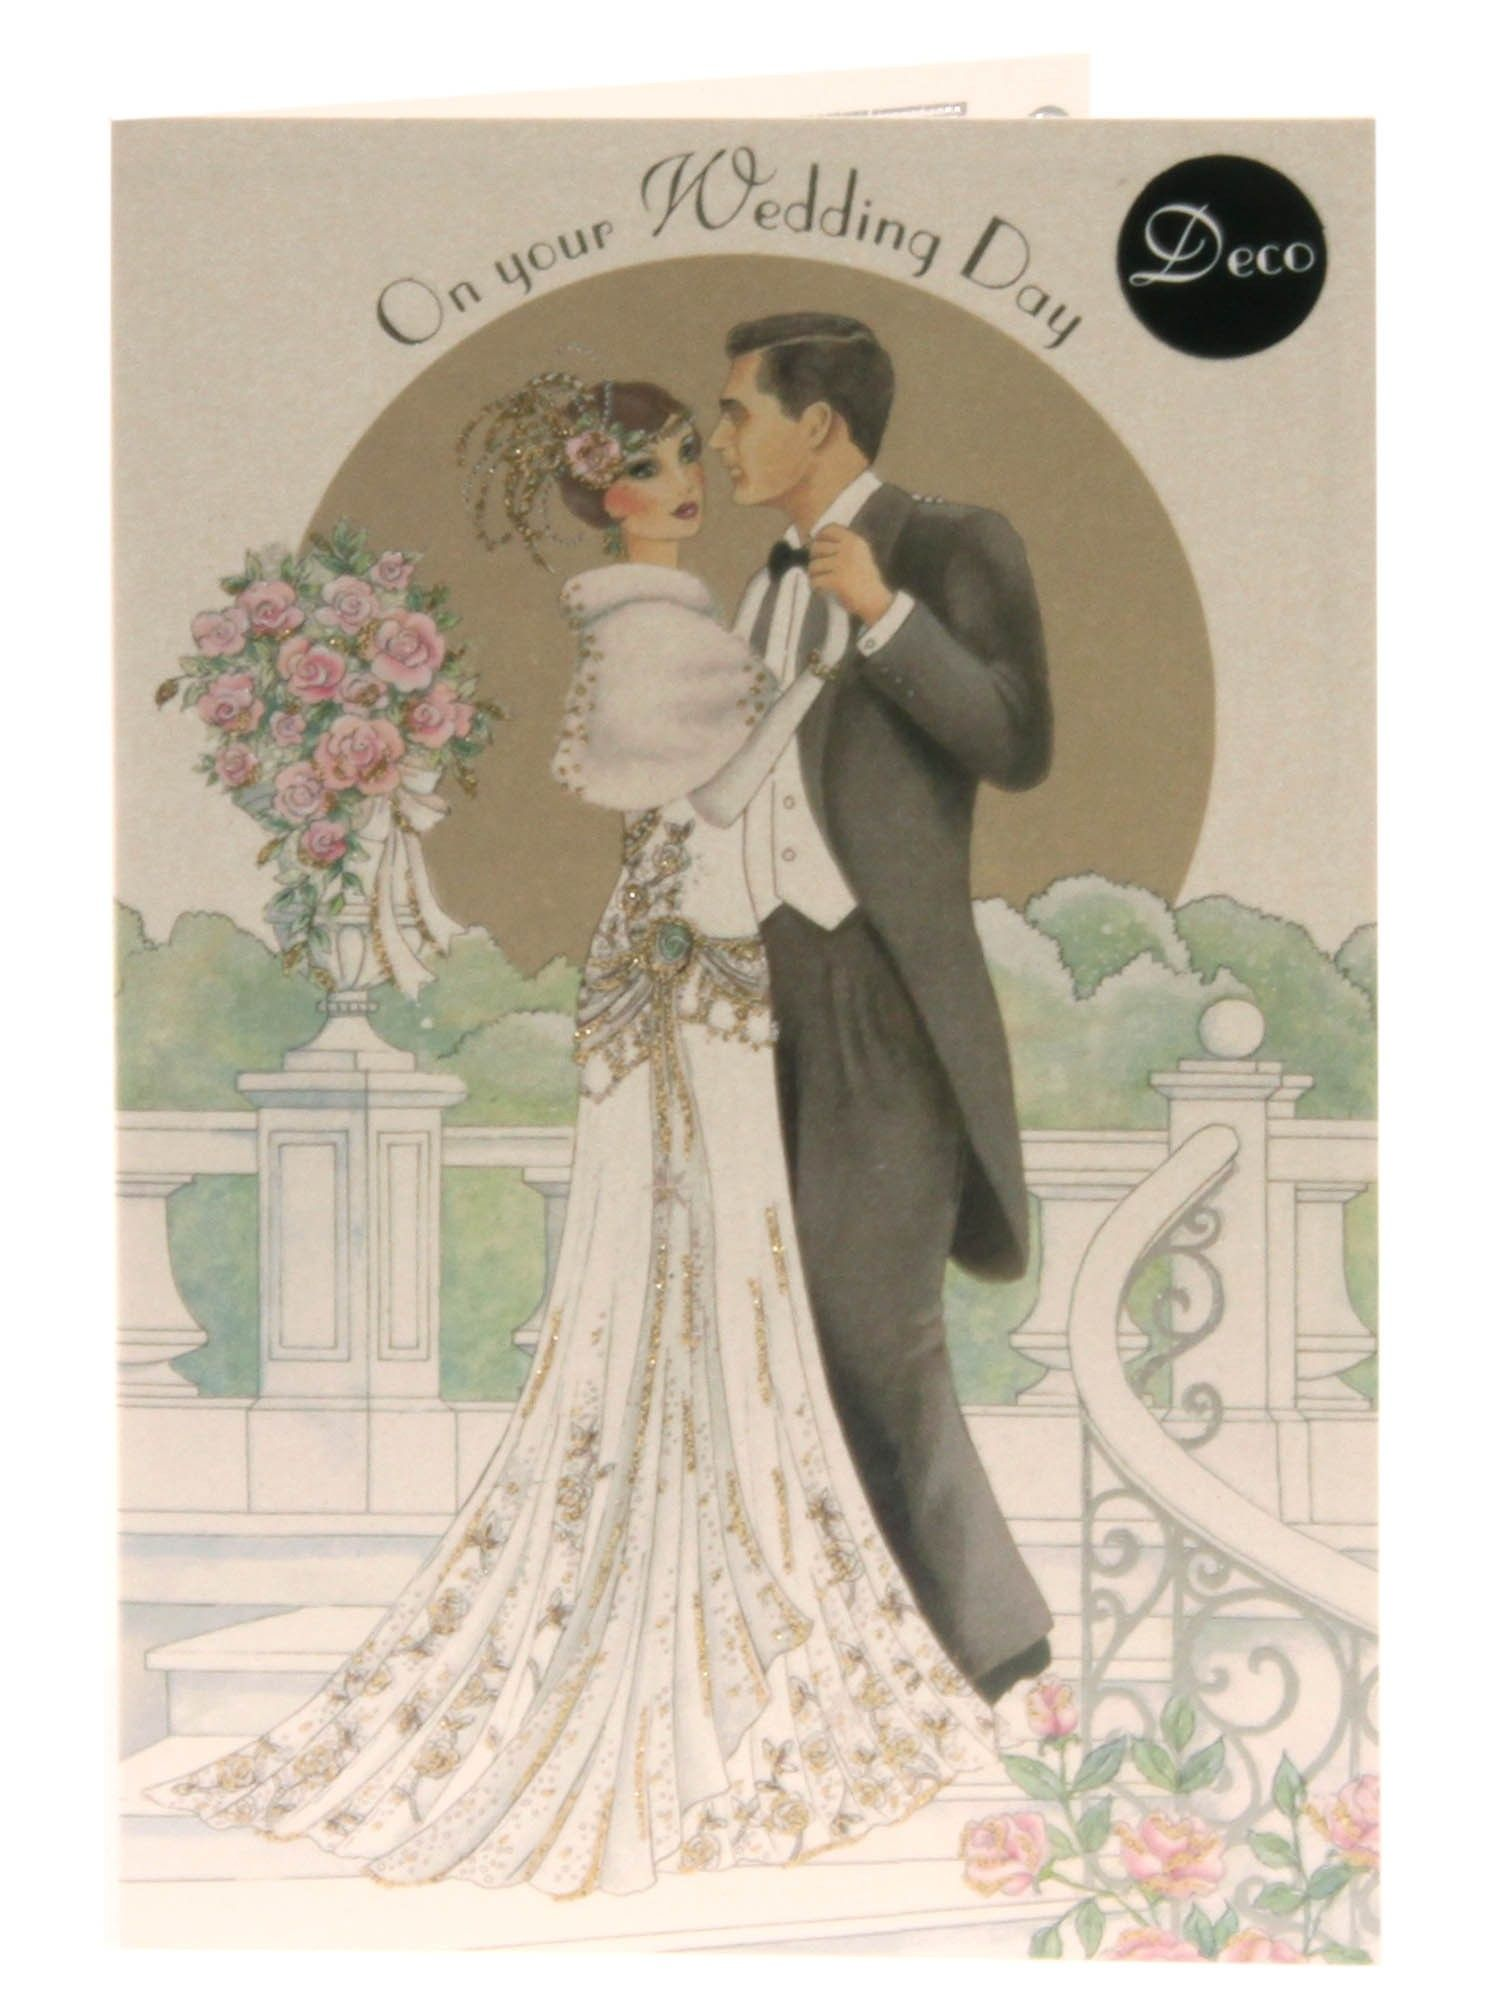 Art Deco Cards Clintons Google Search Art Deco Cards Art Deco Wallpaper Art Deco Illustration